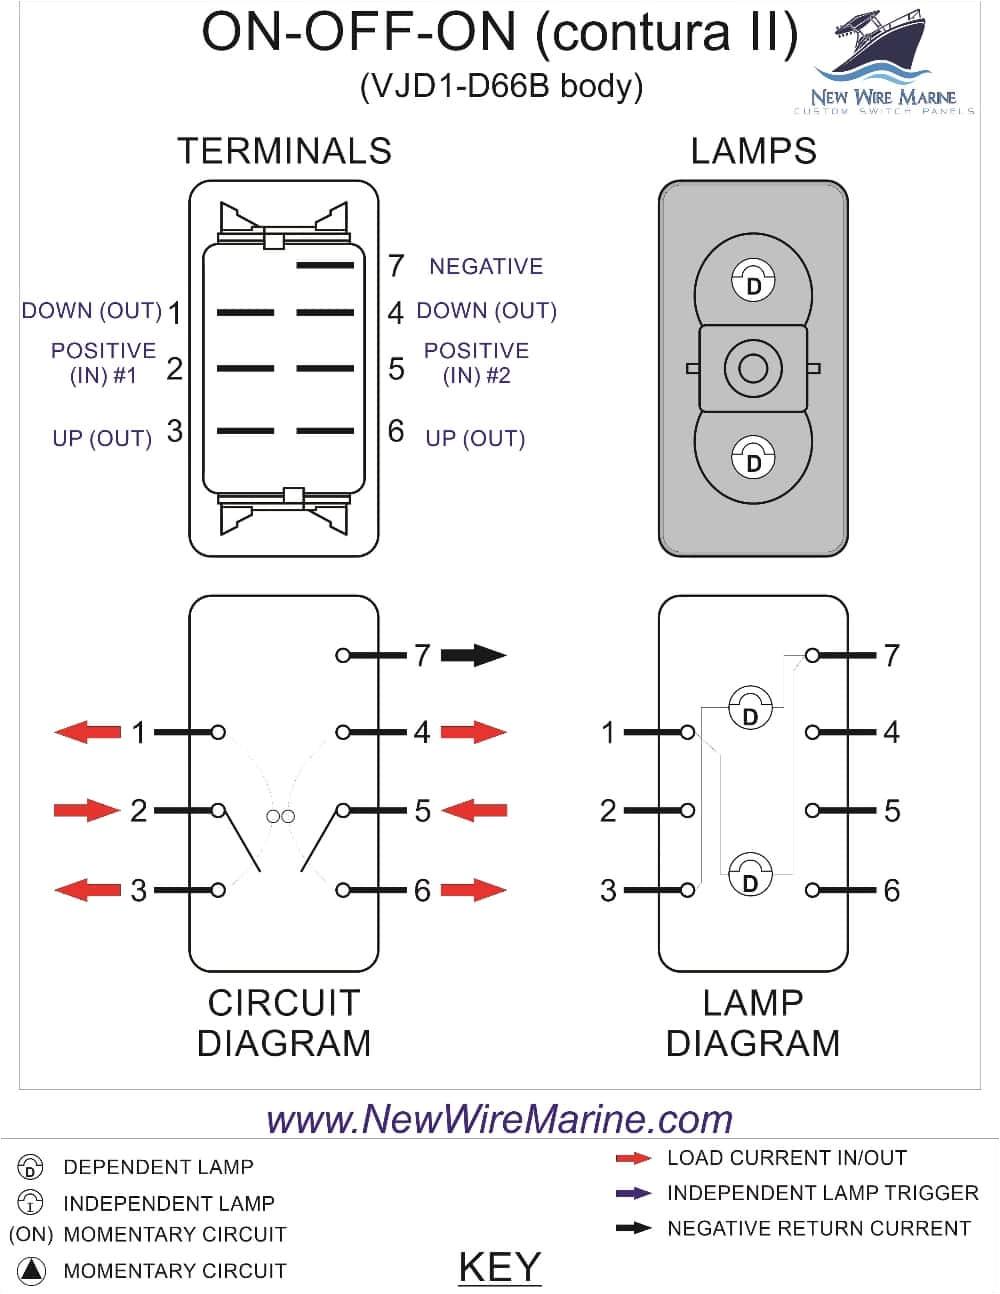 dorman rocker switch wiring diagram option wiring diagram dorman wiring diagram dorman wiring diagram